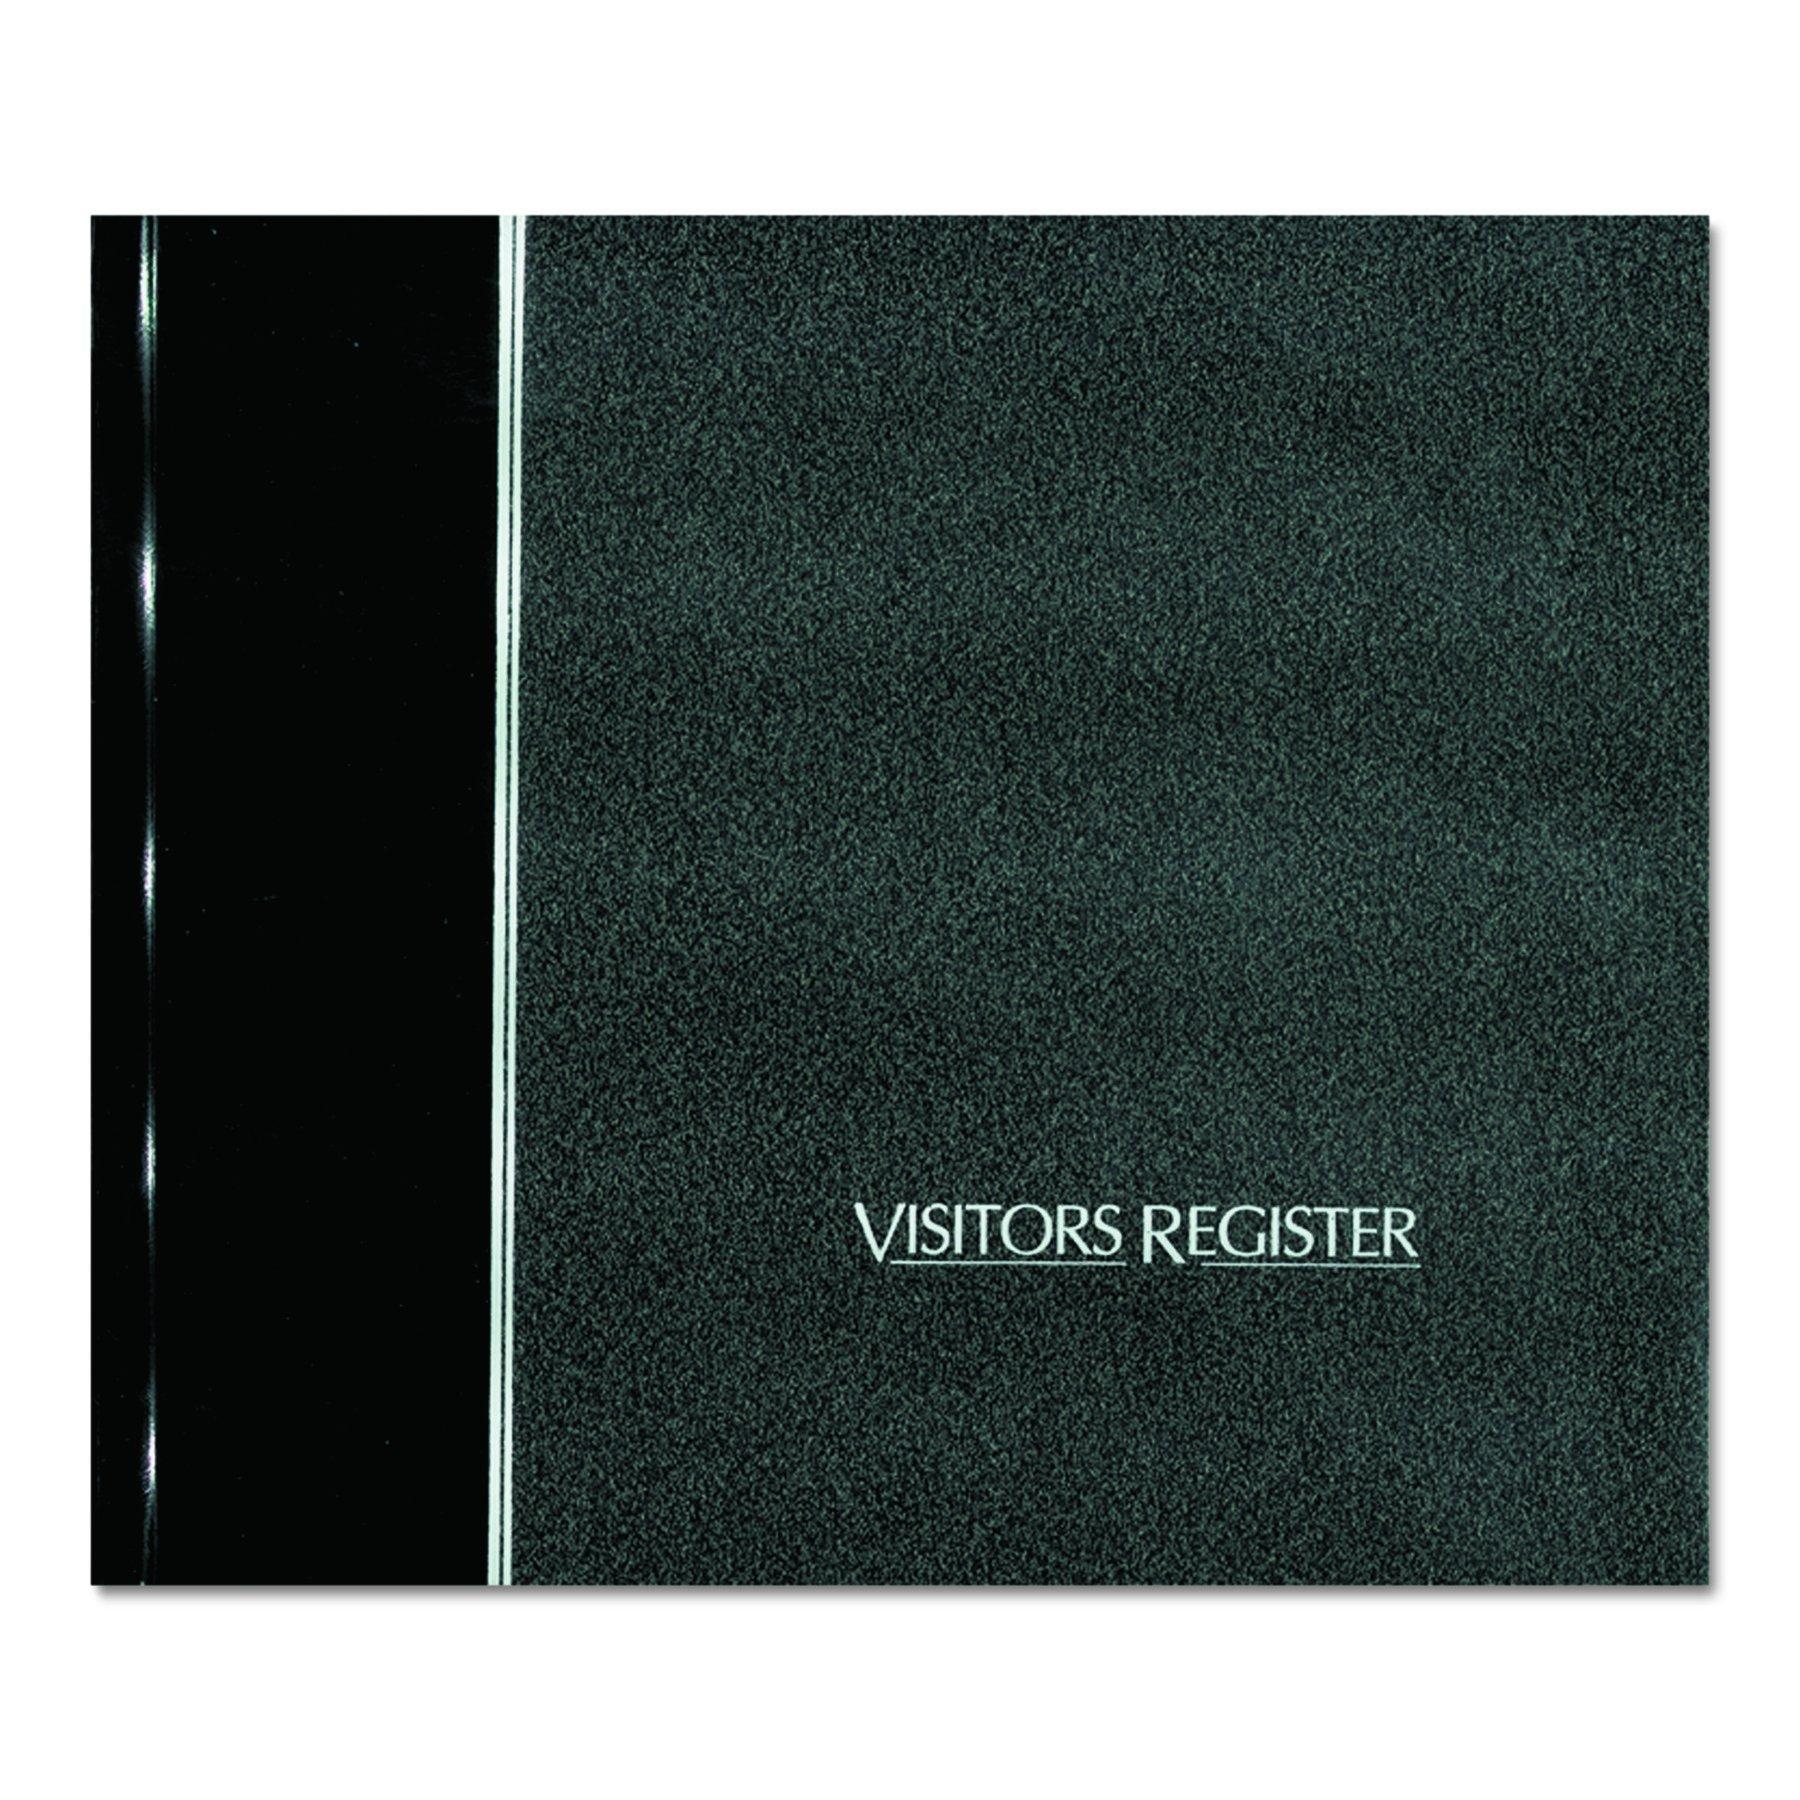 NATIONAL Visitor's Register Book, Black, 8.5'' x 9.875'' 64 Sheets (57802)